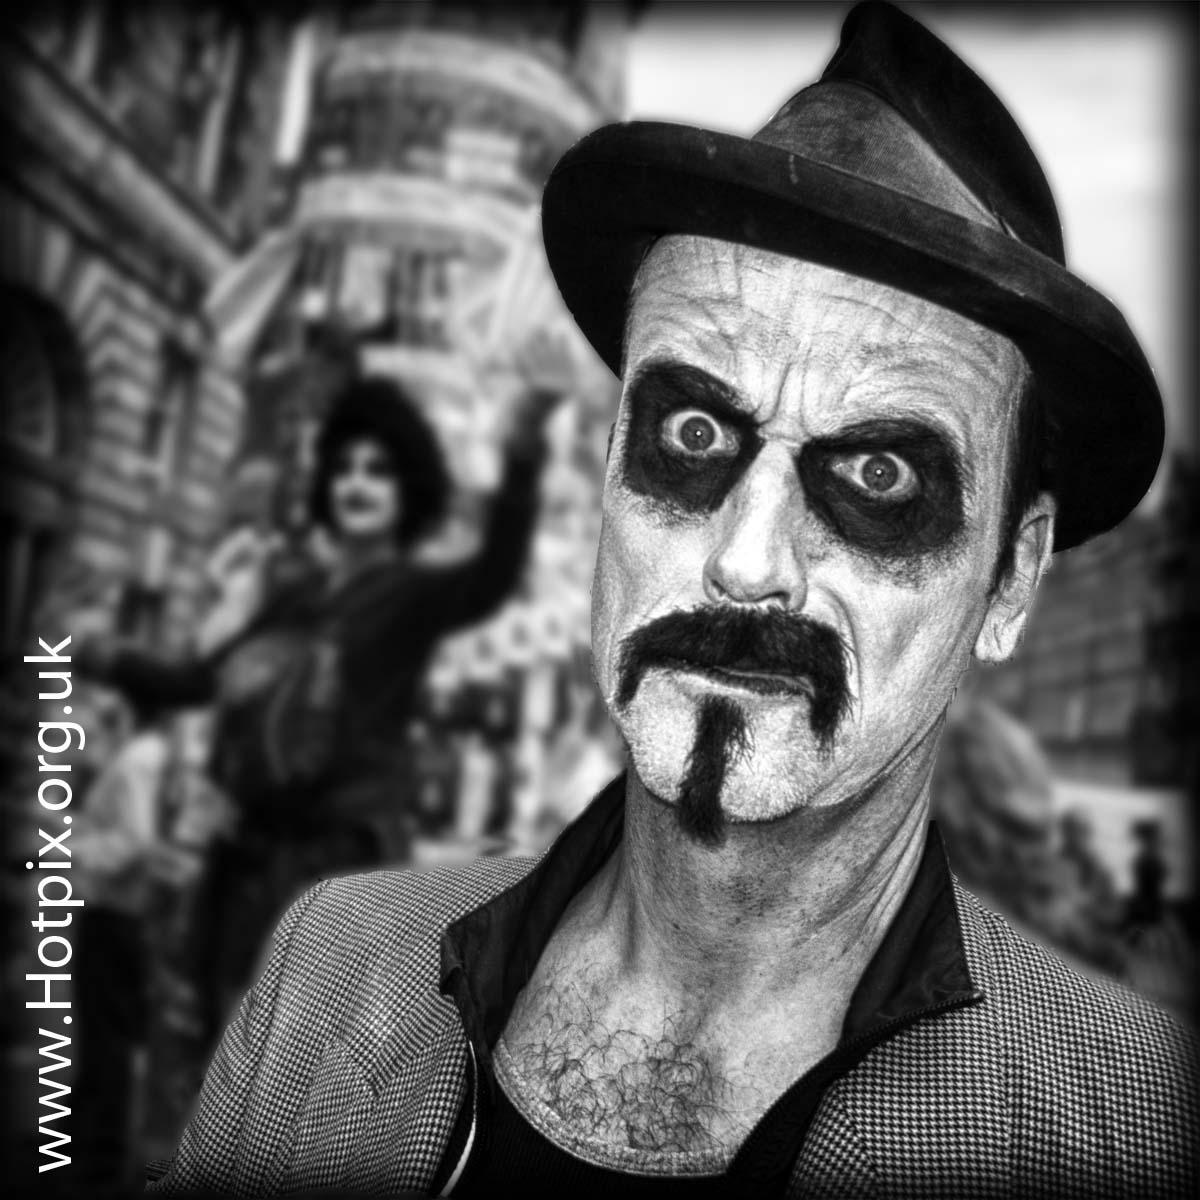 fringe2012,fringe,2012,Edinburgh,Scotland,High,St,Street,Royal,Mile,portrait,character,man,scary,image,photo,movie,hat,shallow,focus,mr,mrs,clarke,medicine,show,event,B/W,mono,square,HDR,urban,contrast,@hotpixuk